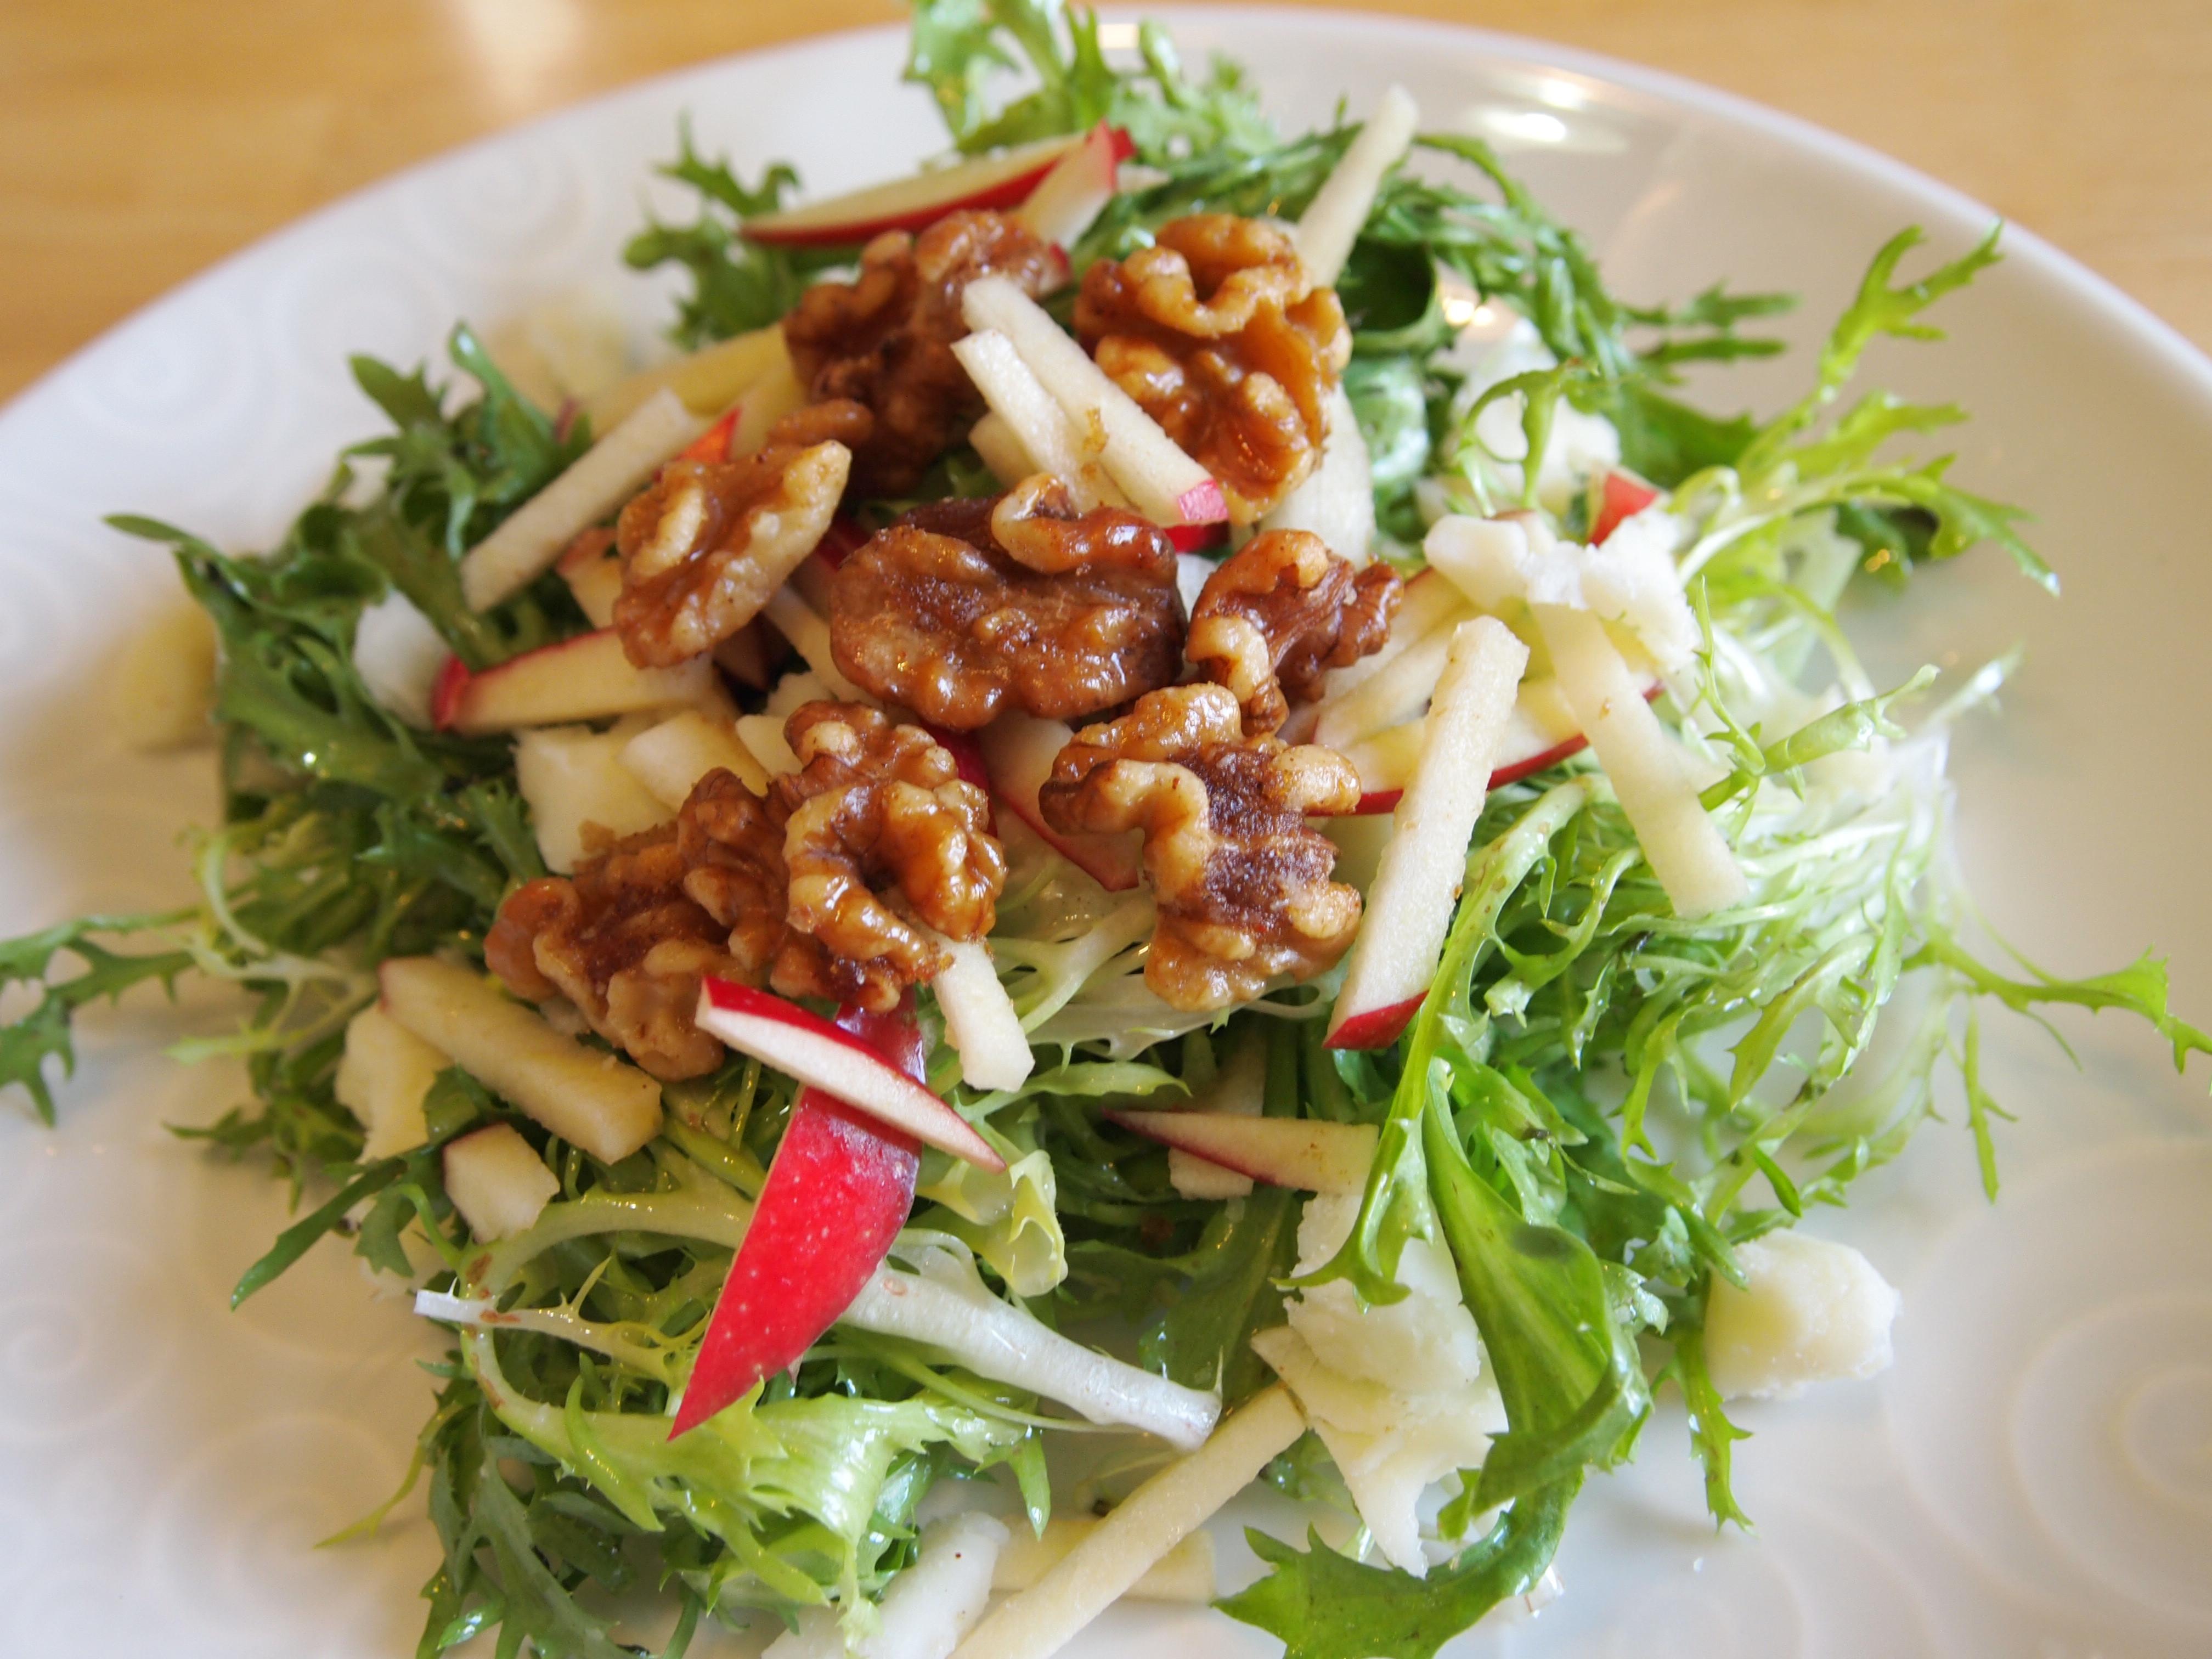 Apple Salad Recipes  Can d Walnut Frisee and Apple Salad Recipe culicurious